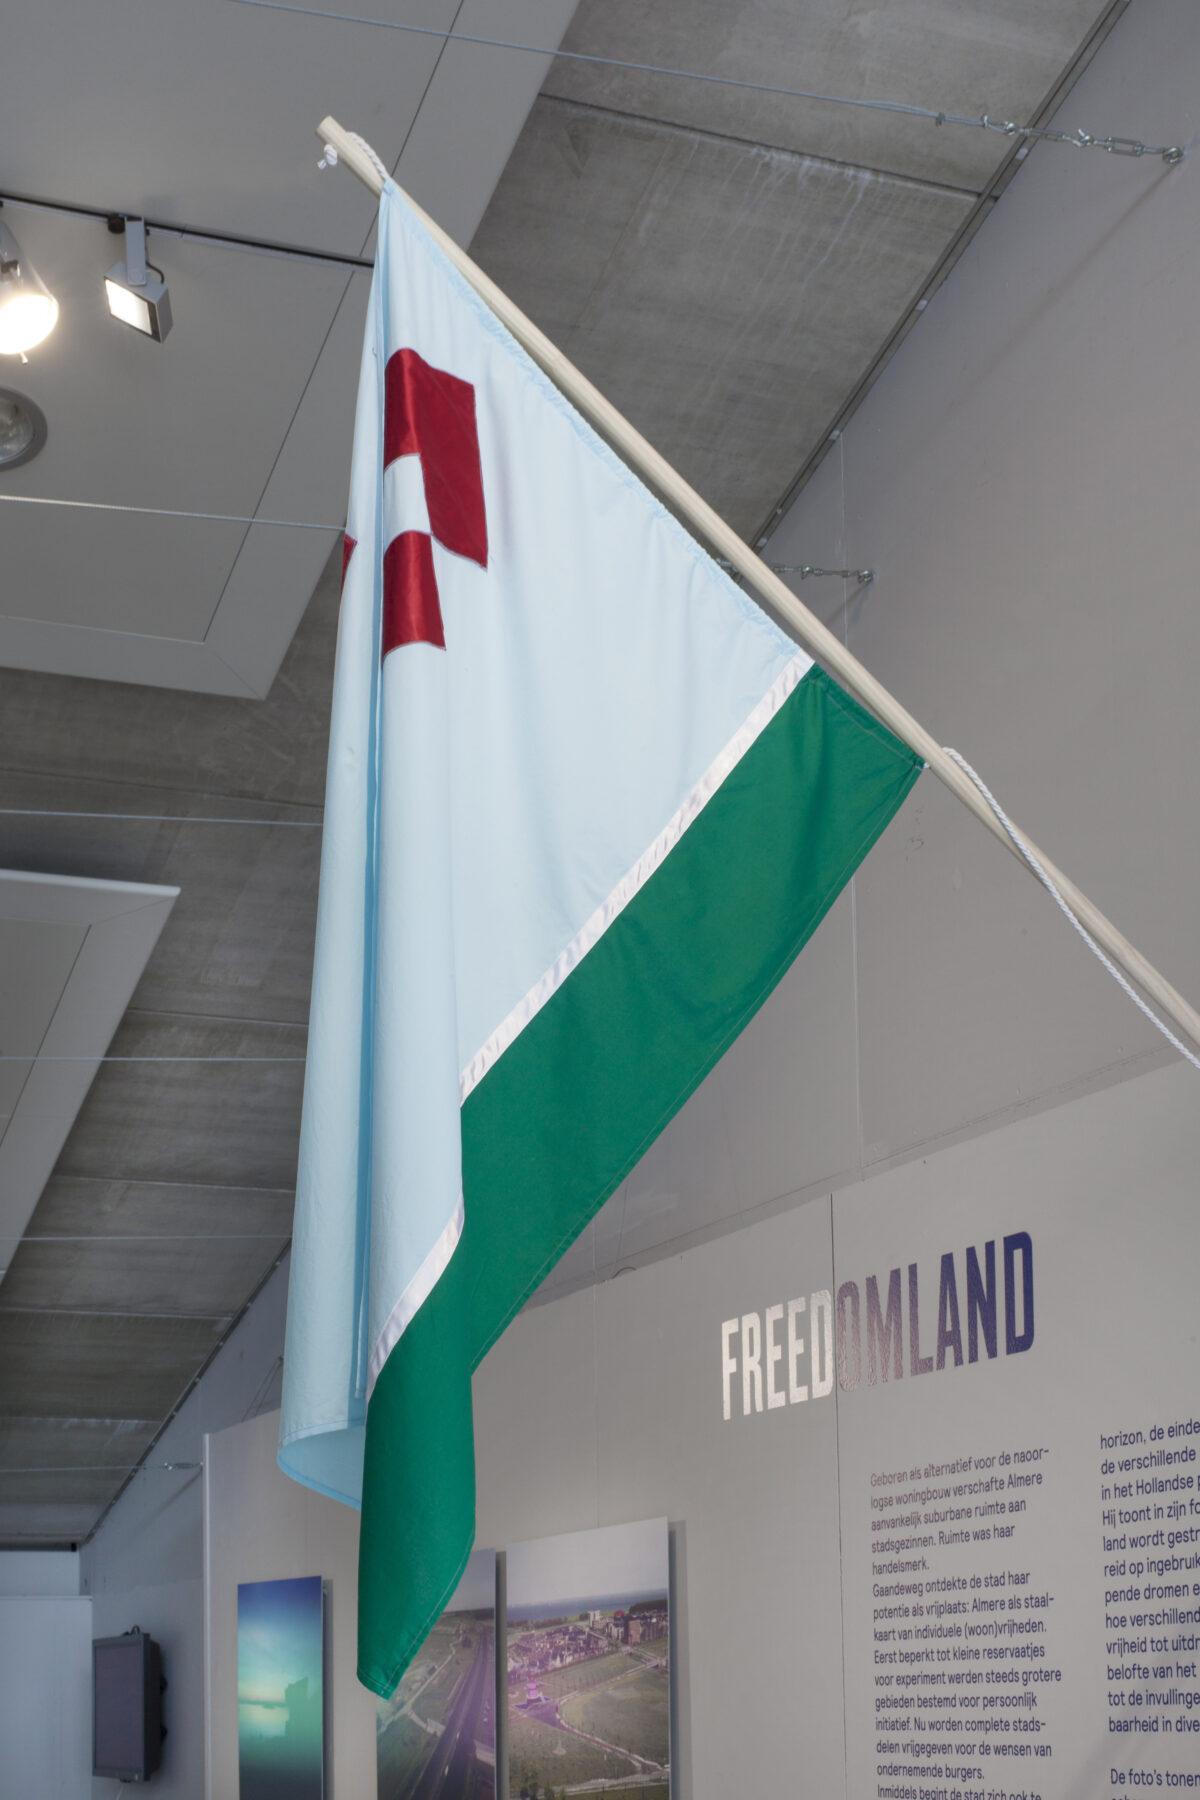 Freedomland_DenisGuzzo_Installation view_Amlere2013-8393